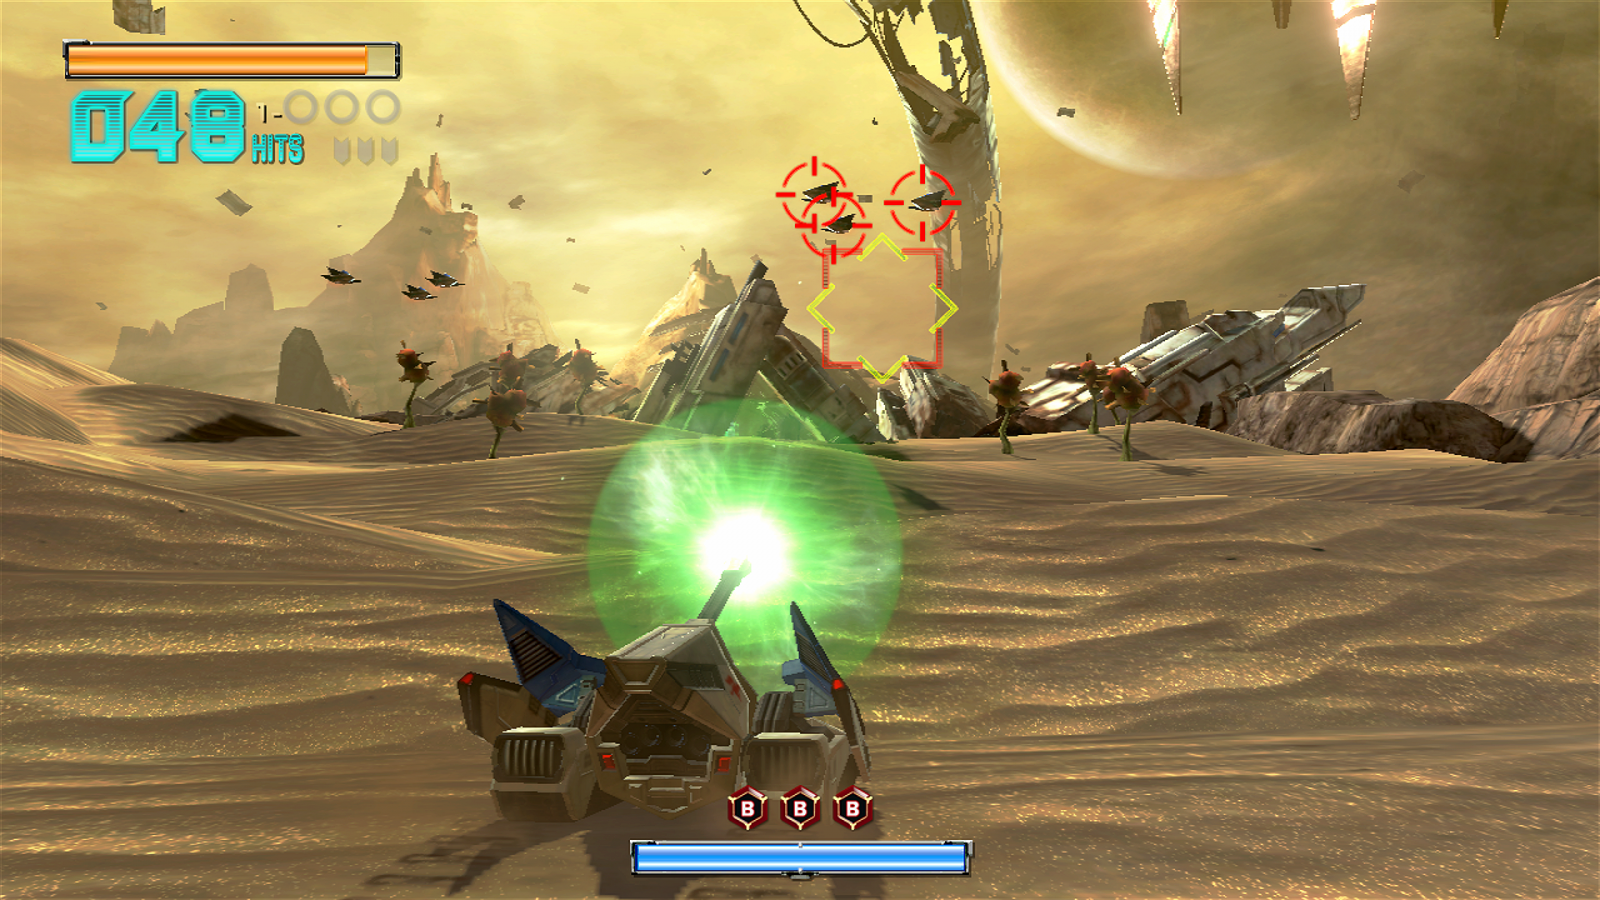 Targeting on Titania